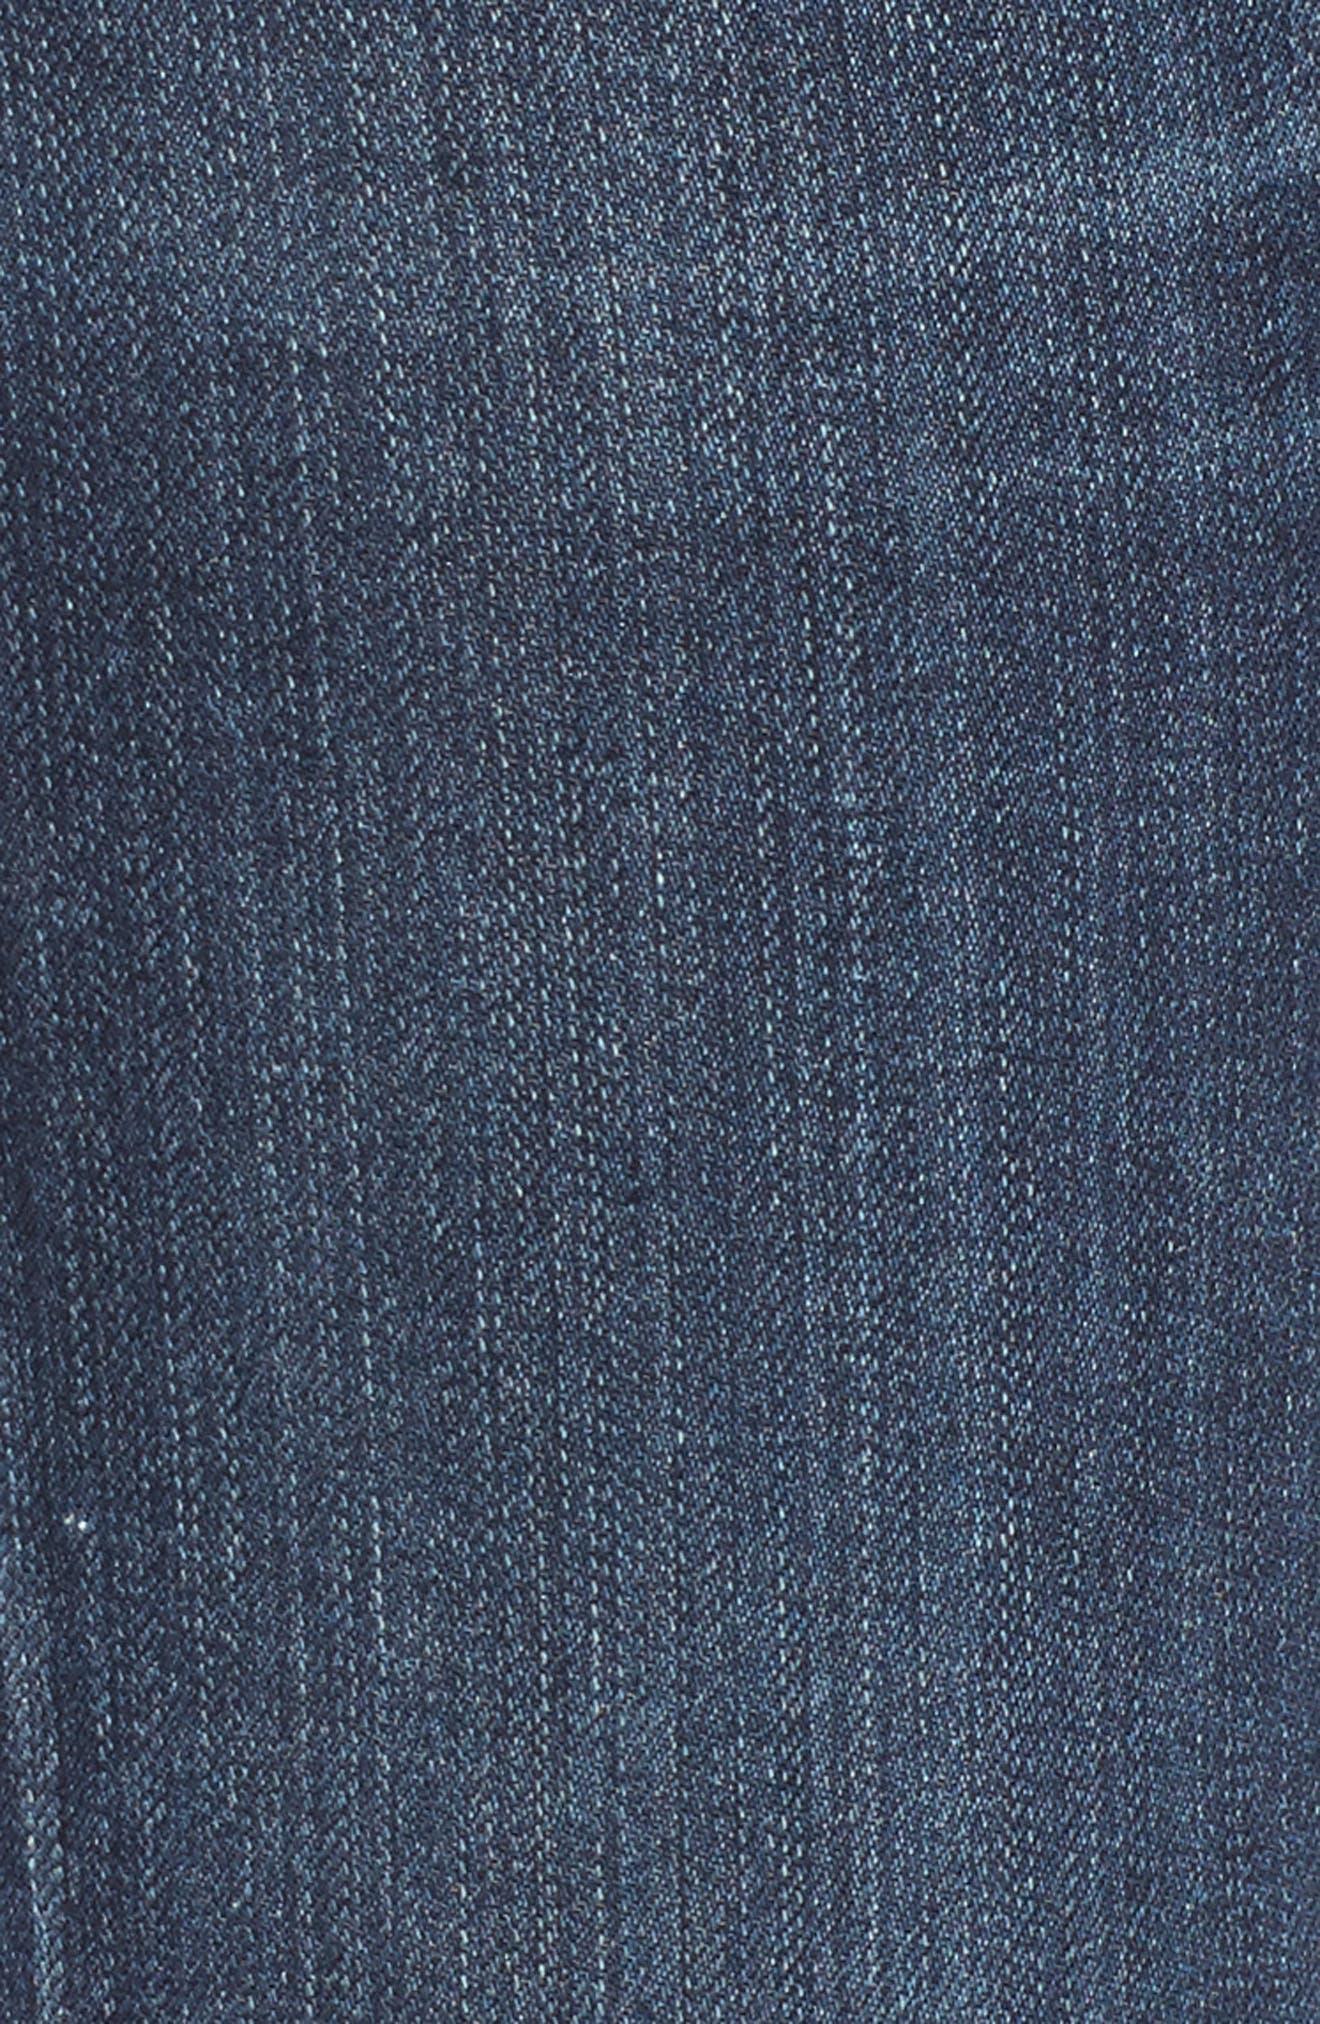 Rocket Step Hem Skinny Jeans,                             Alternate thumbnail 6, color,                             401